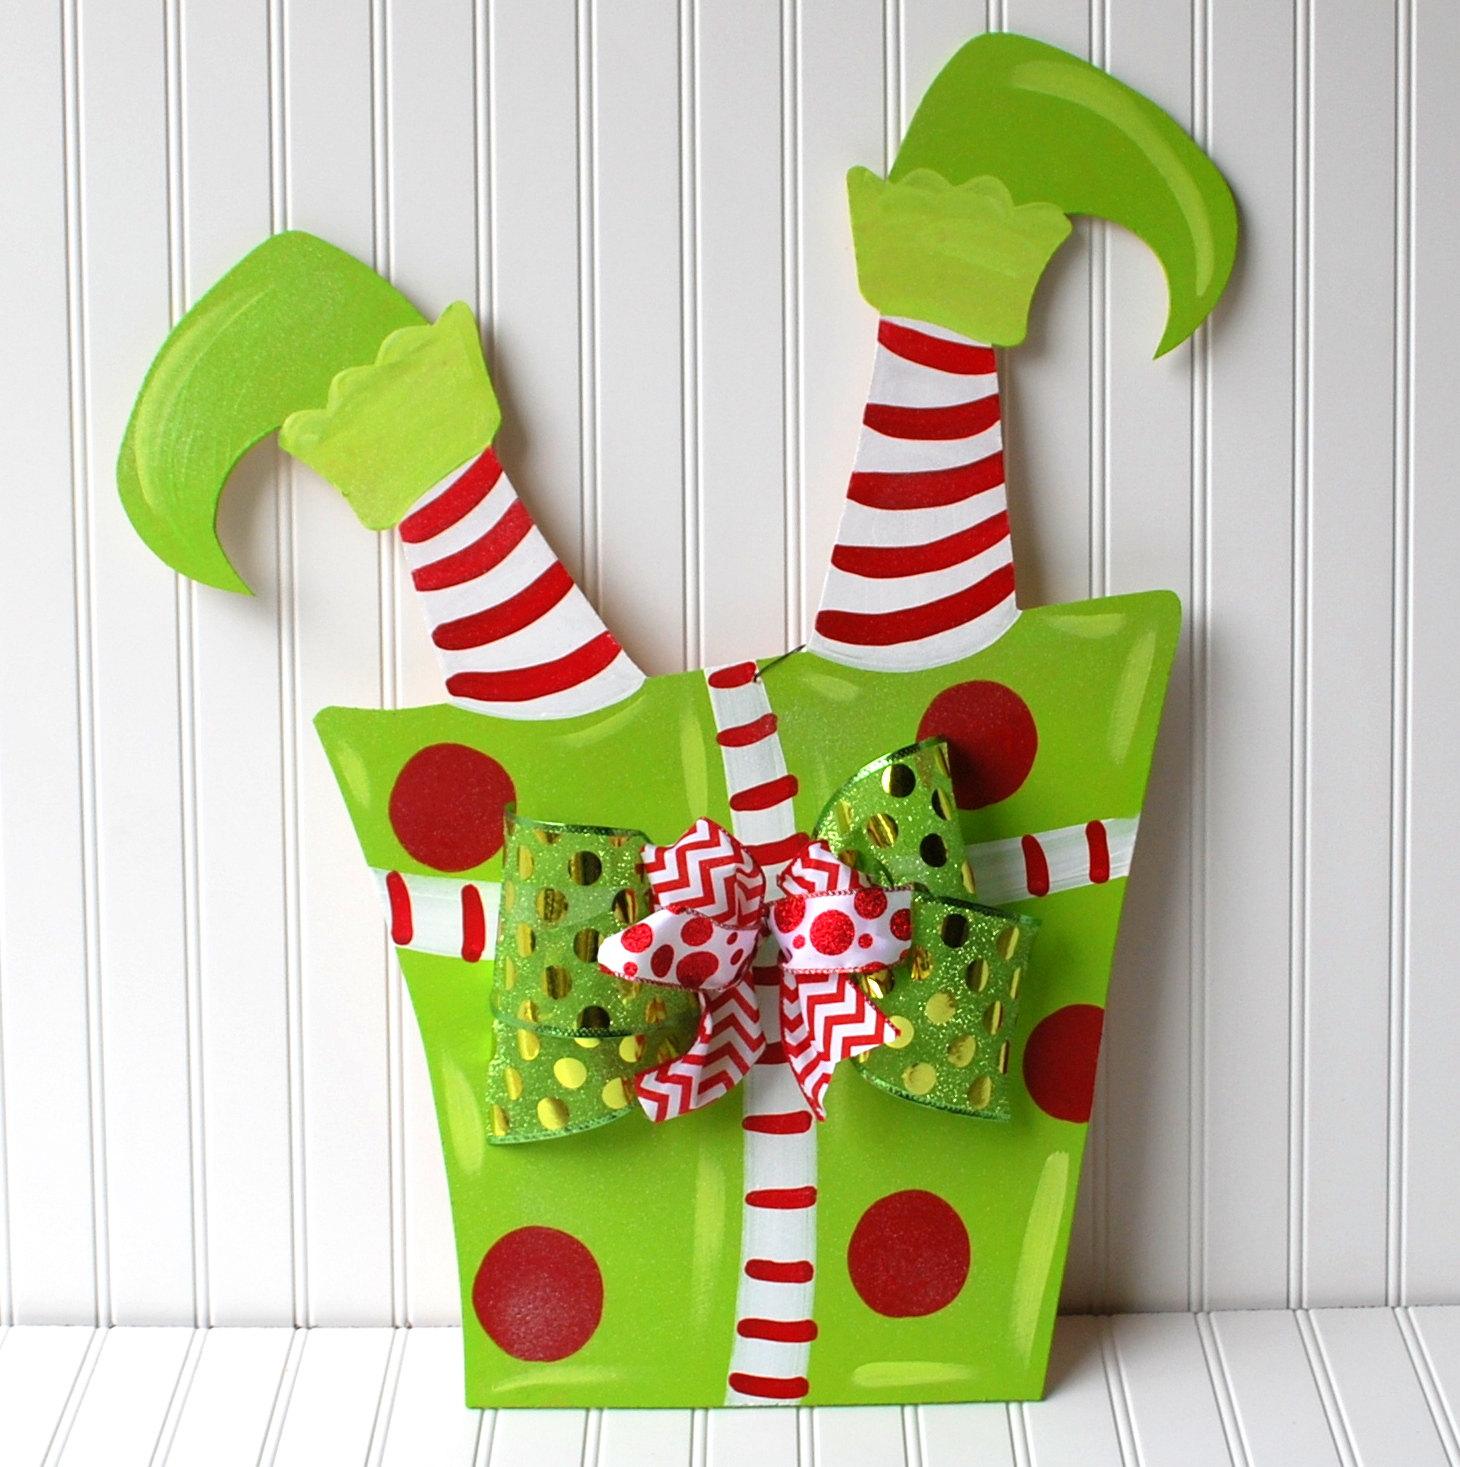 Elfen clipart holiday hat Holiday Wreath Elf Wreath Wreath